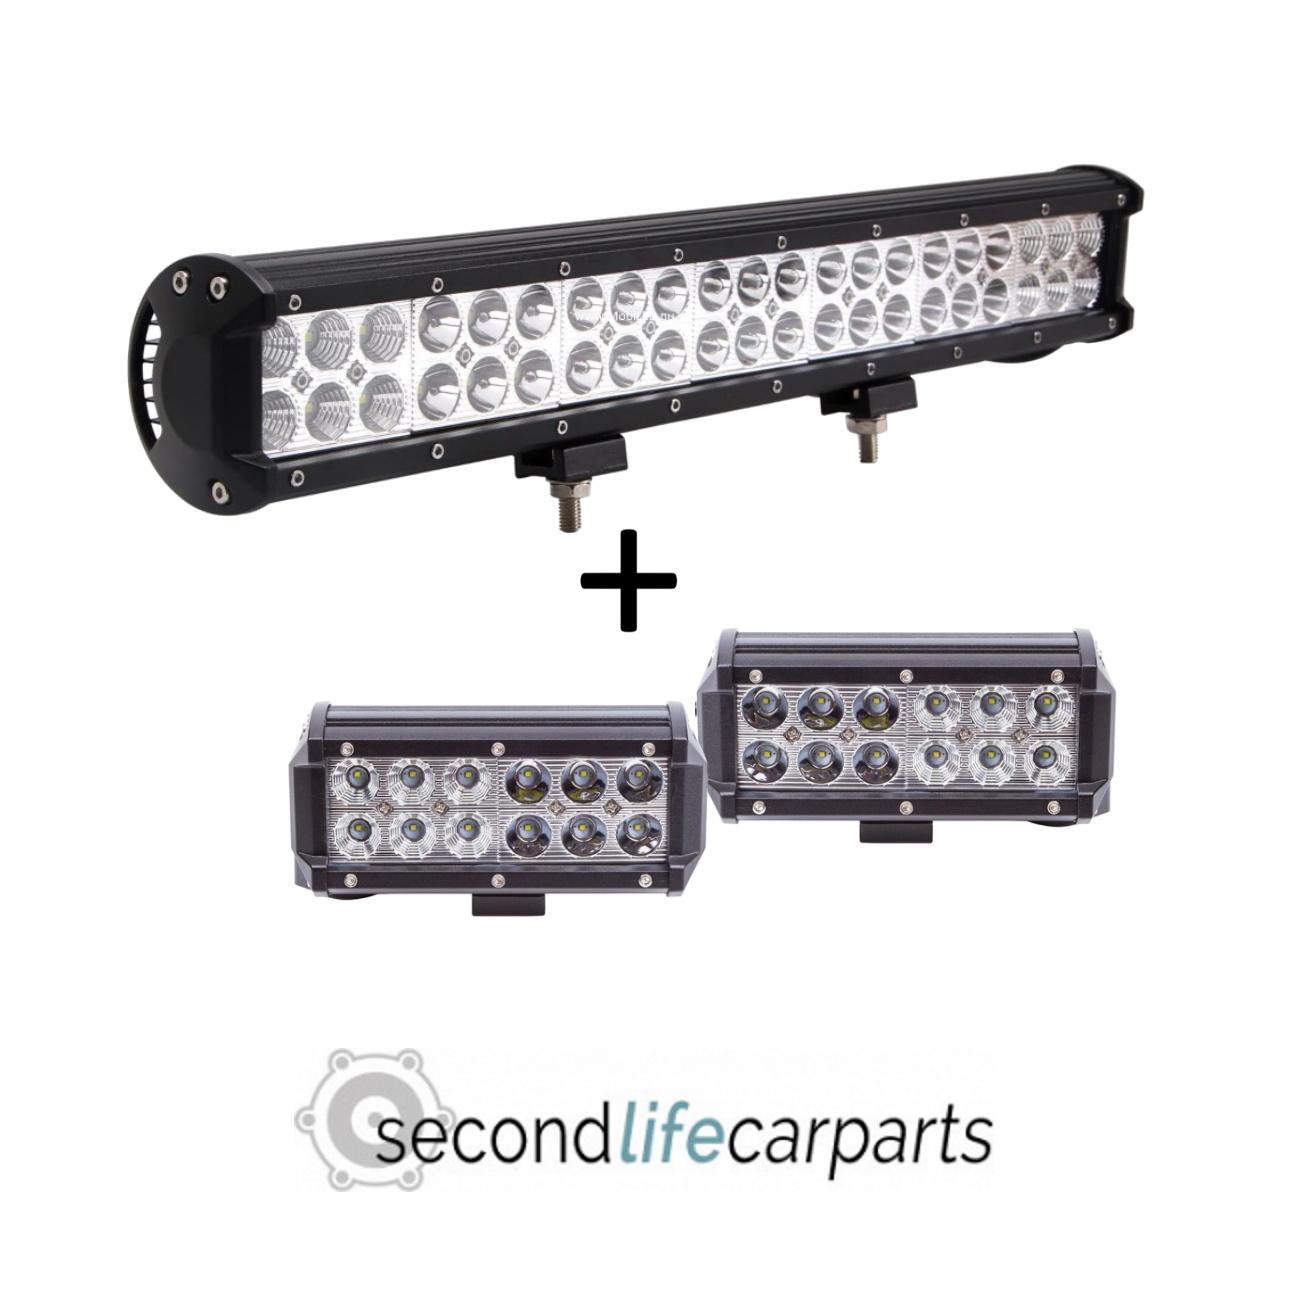 126w + 2x 36w combo beam light bars